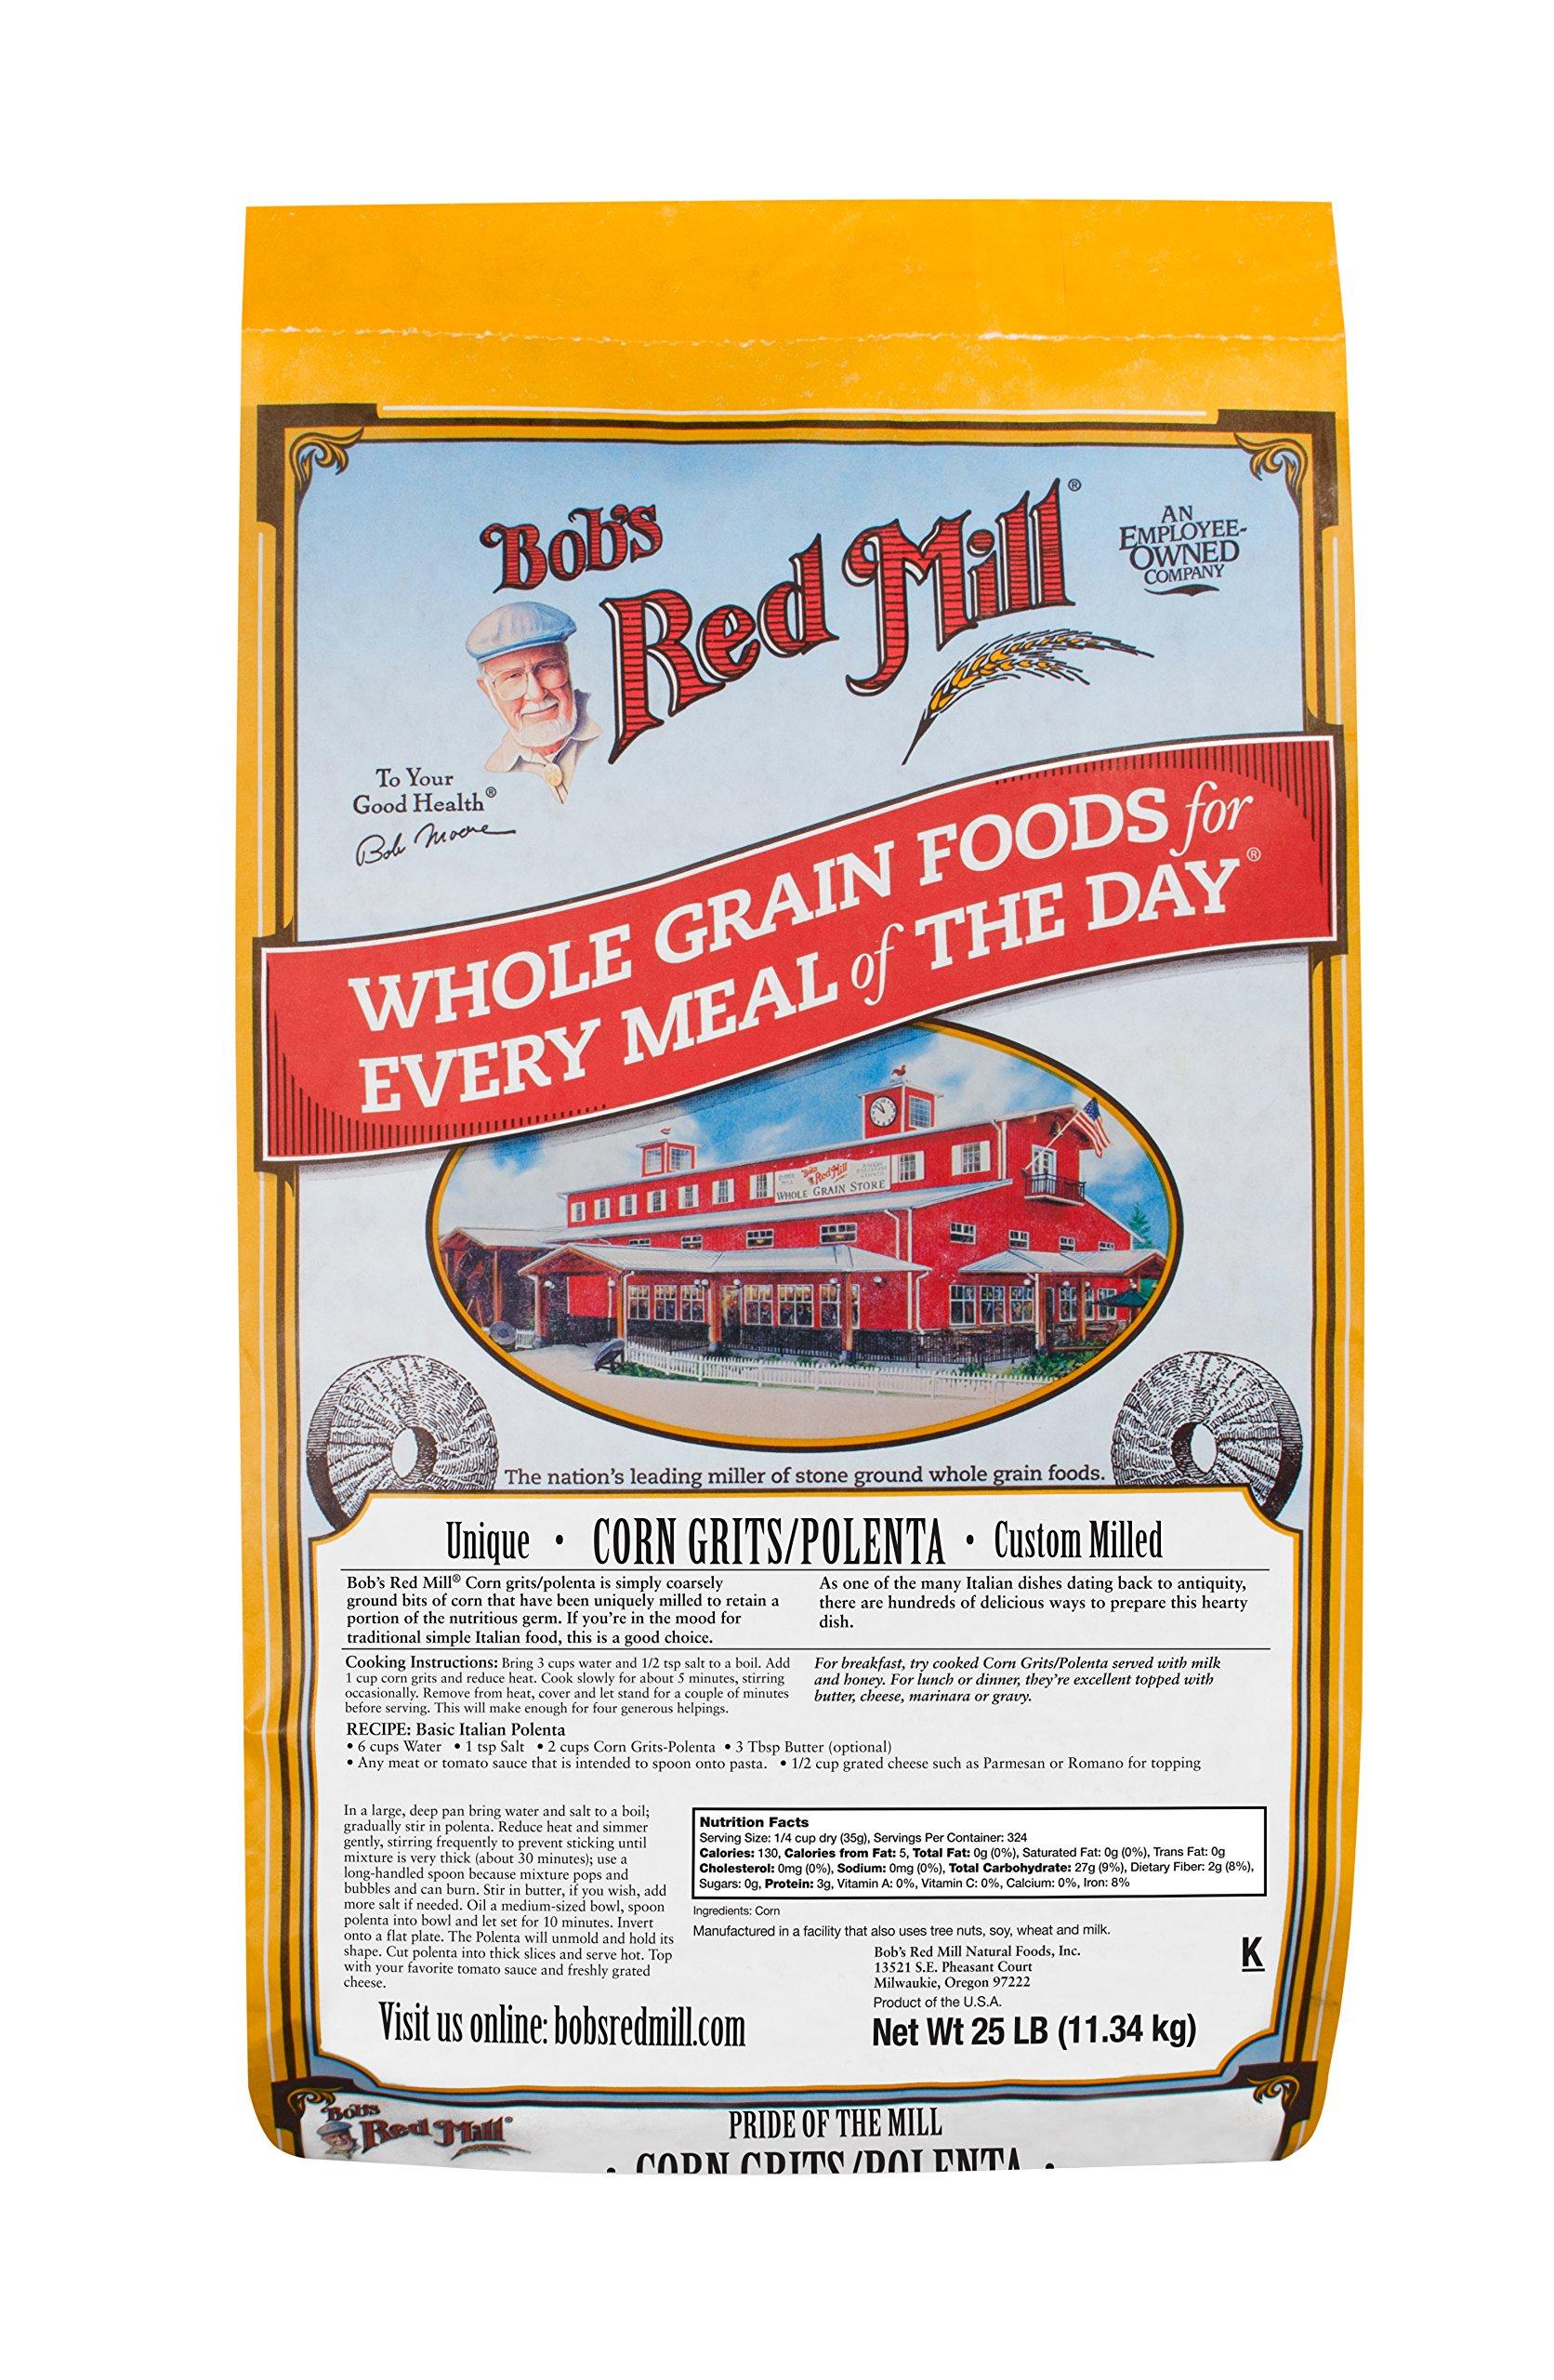 Bob's Red Mill Corn Grits/Polenta, 25 Pound